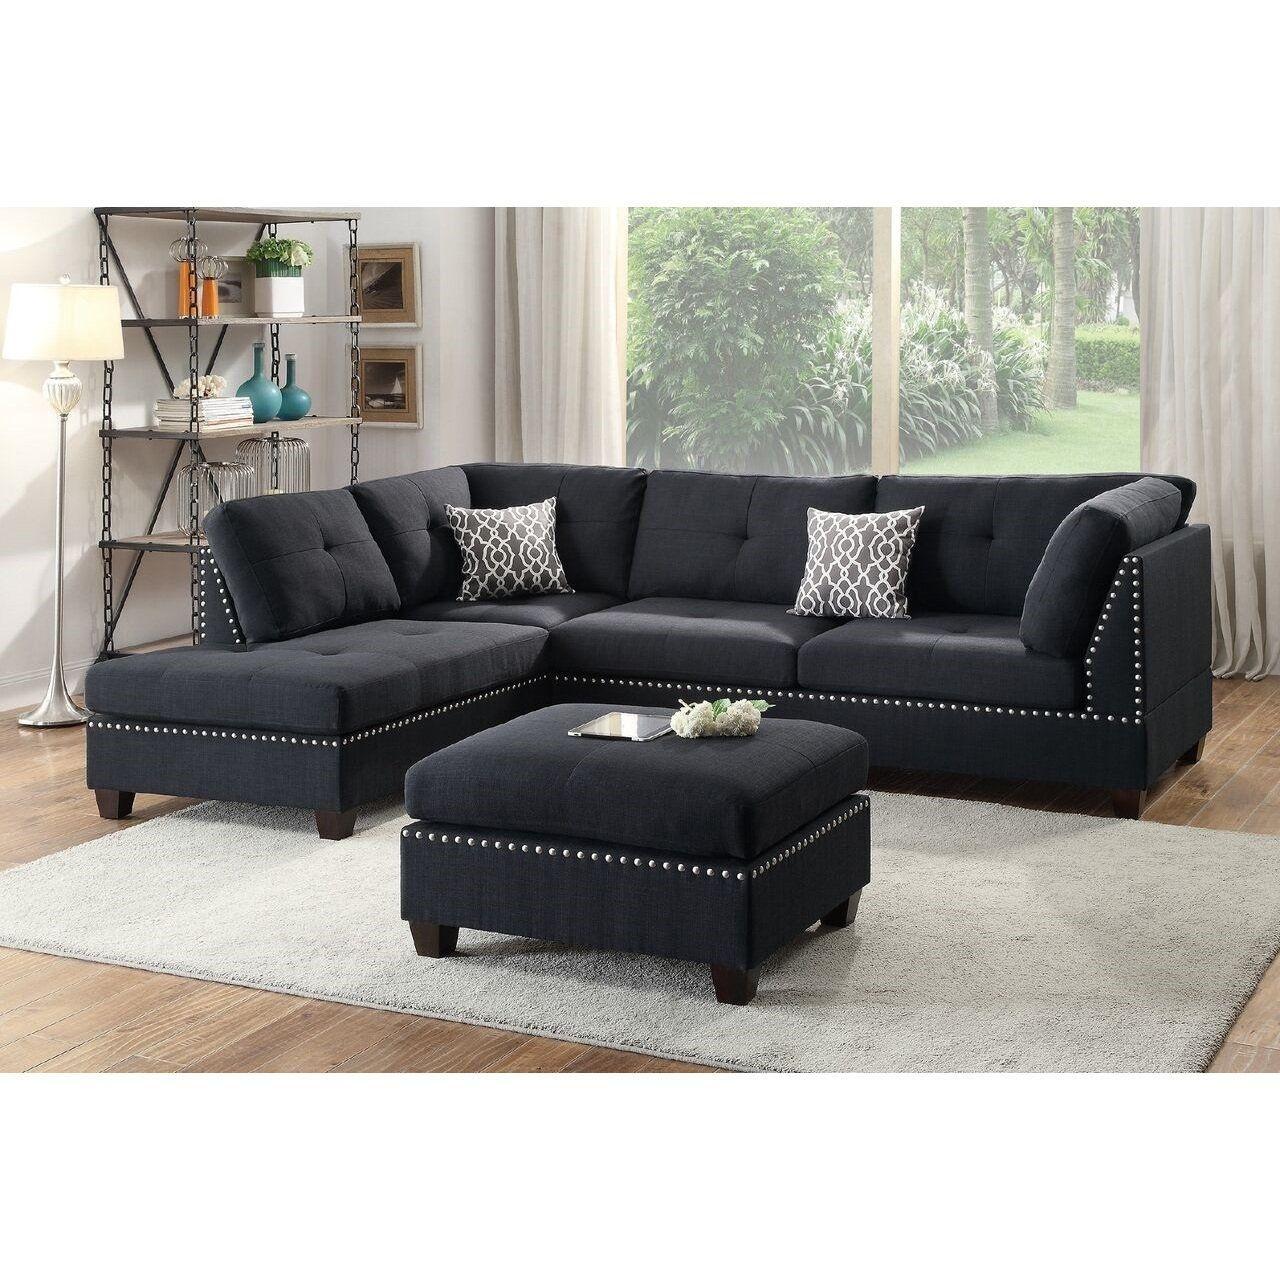 Online Furniture · Poundex Gavar Black Polyfiber Upholstered Sectional Sofa  ...